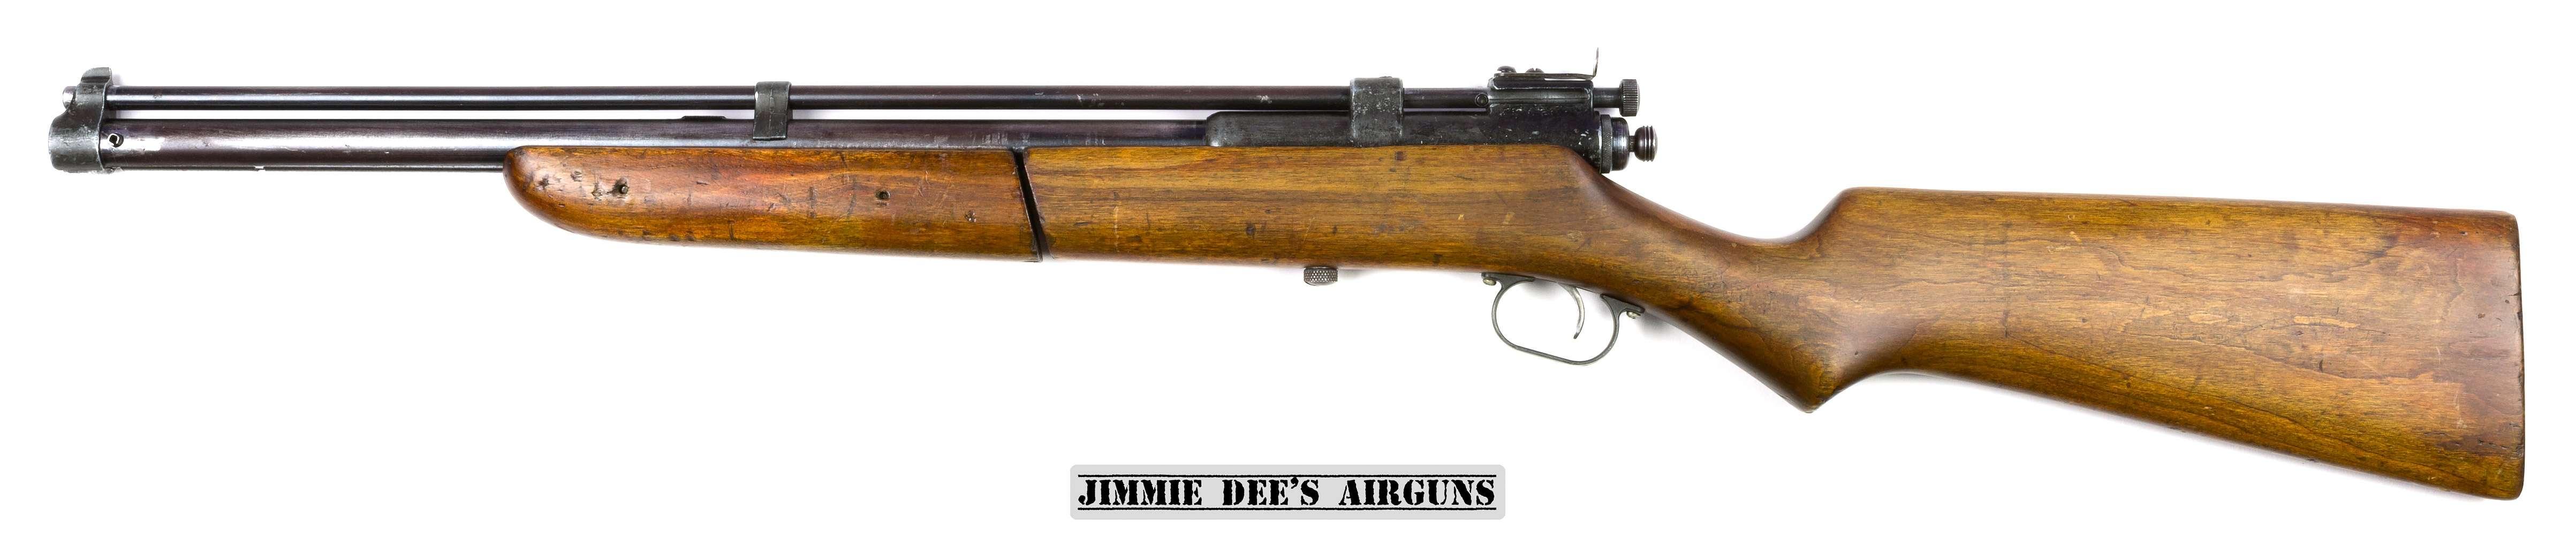 The Challenger Arms Corporation Plainsman Air Rifle (Pneumatic